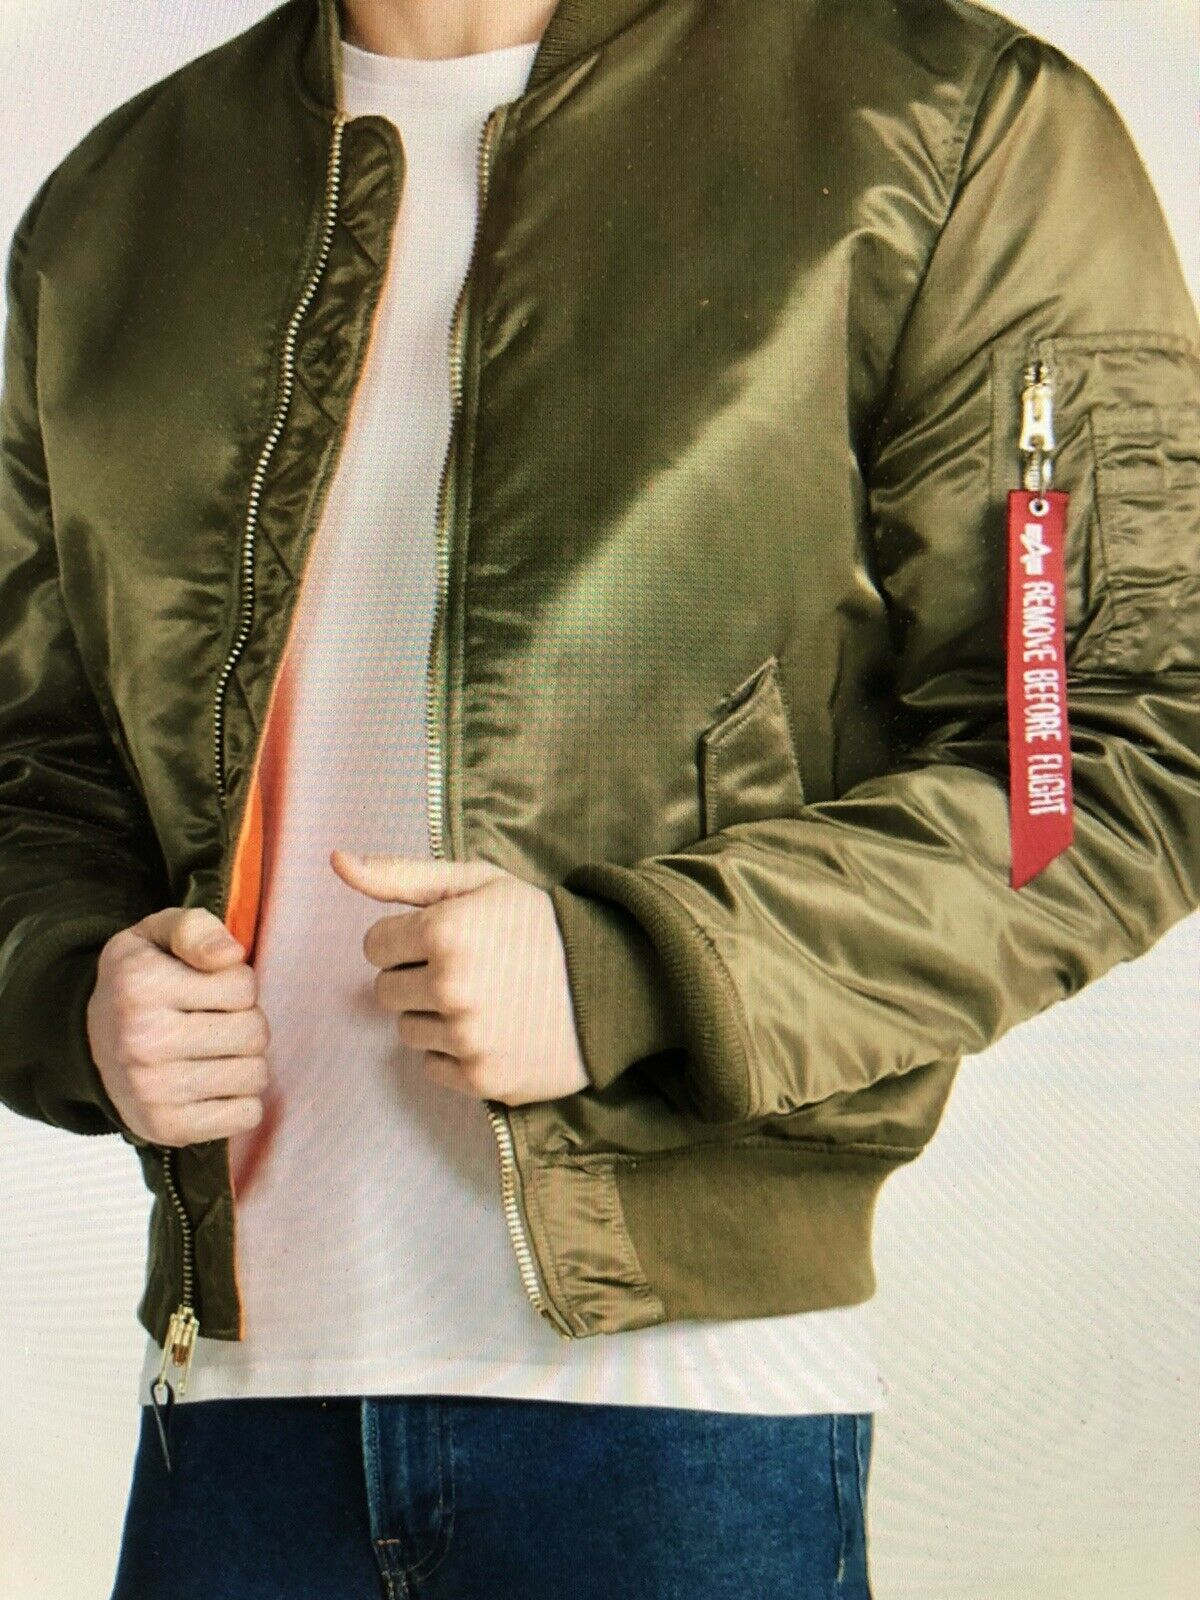 New NIP Polo Ralph Lauren Men Woven Boxers 3-Pack Size M